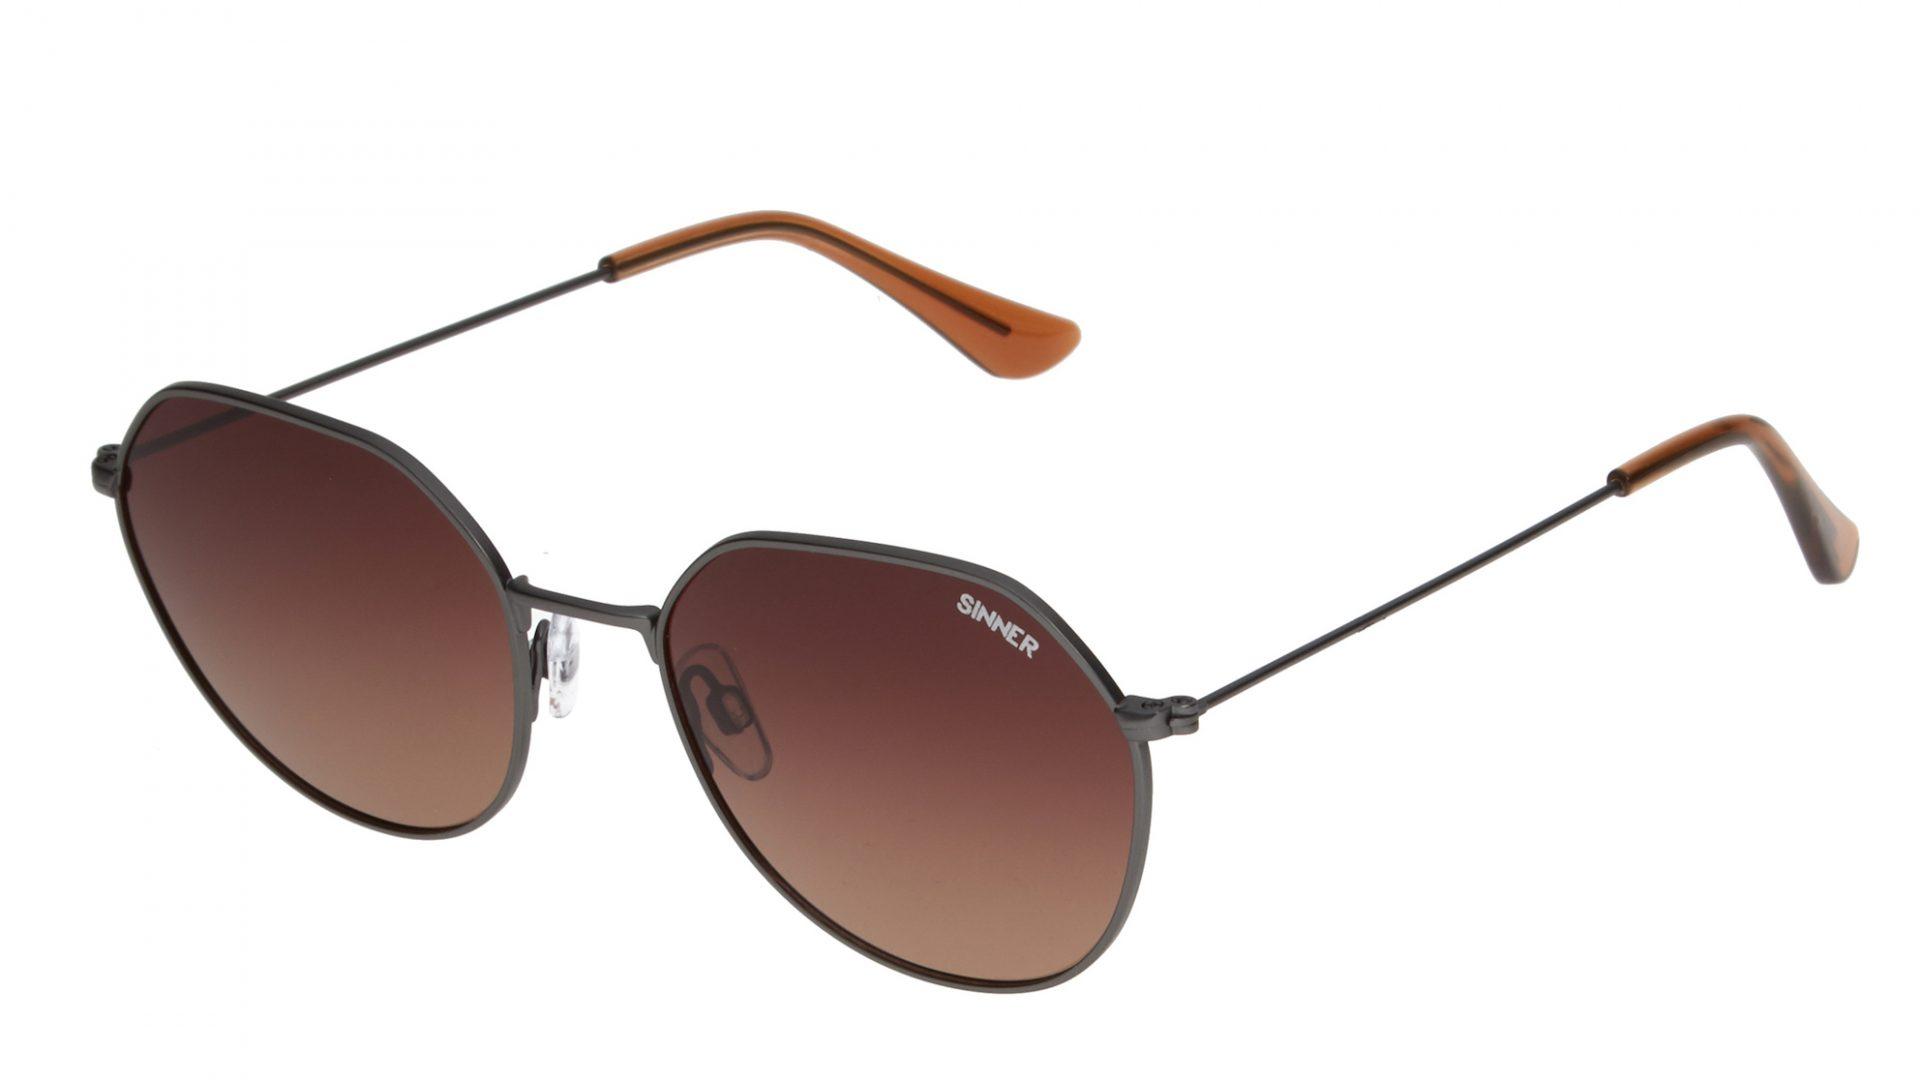 Sinner SS20 Sunglasses